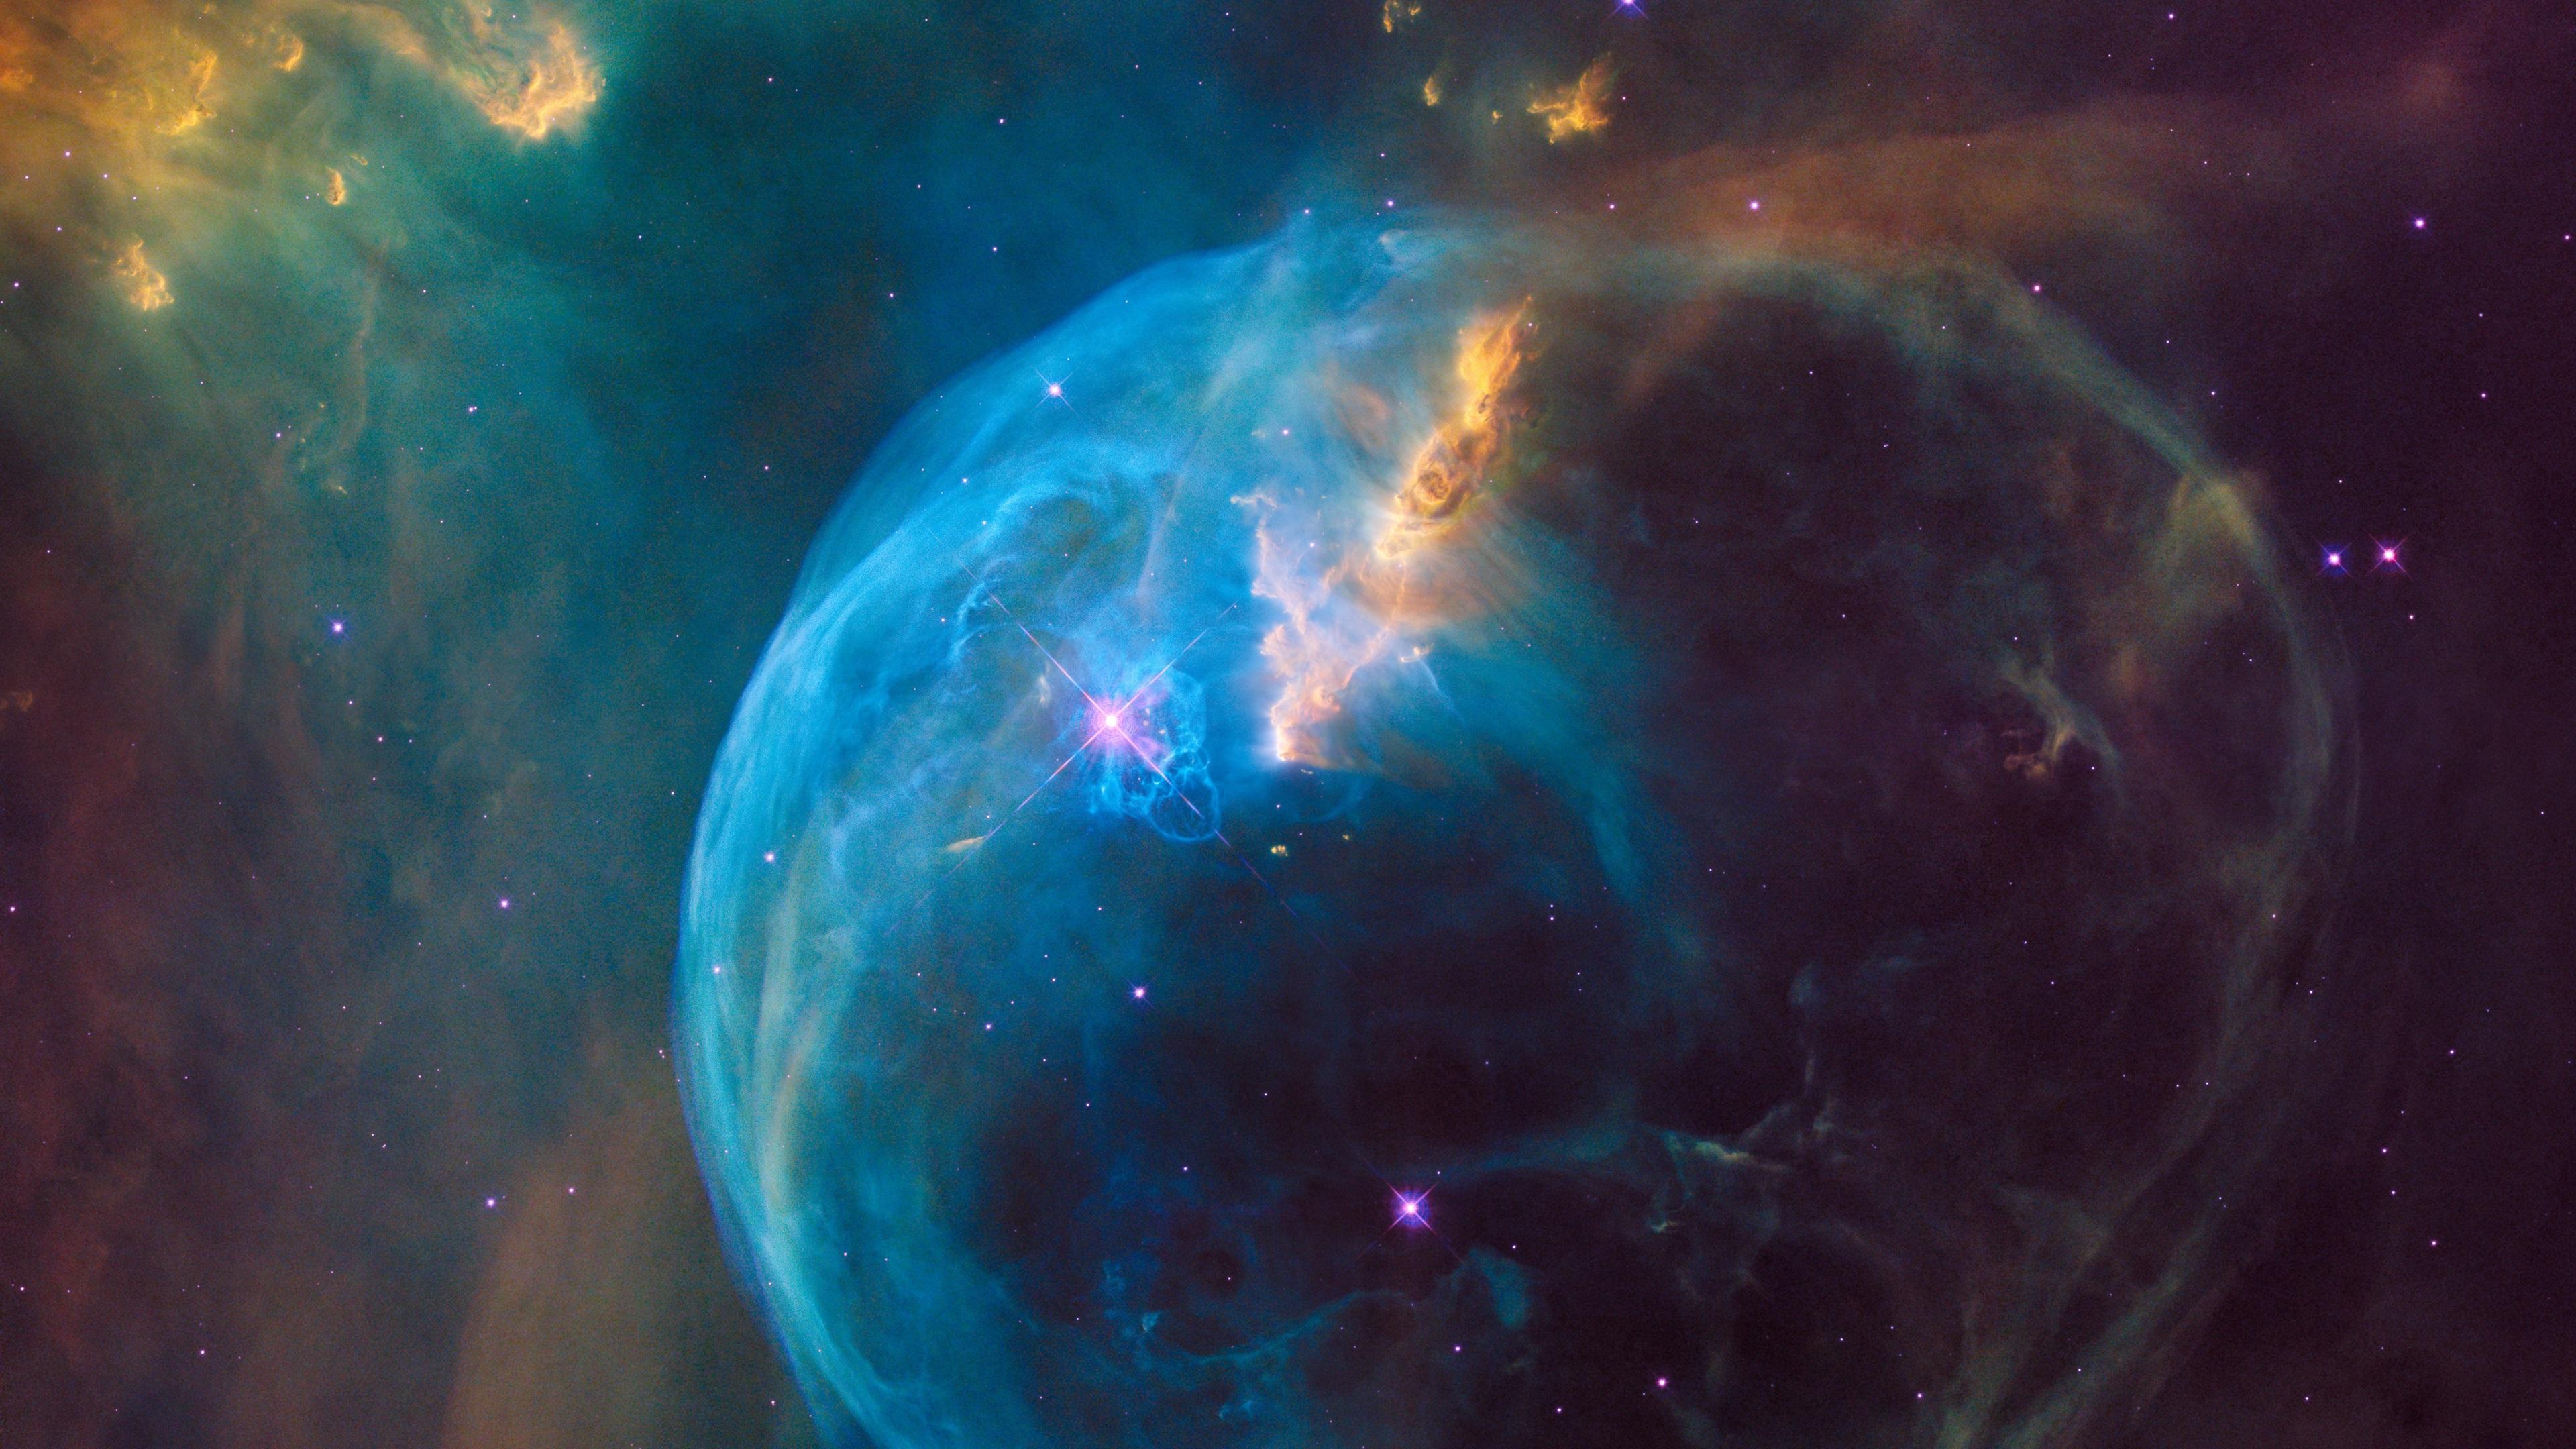 Wallpaper Galaxy Nebula Stars Space NASA 3840x2160 UHD 4K